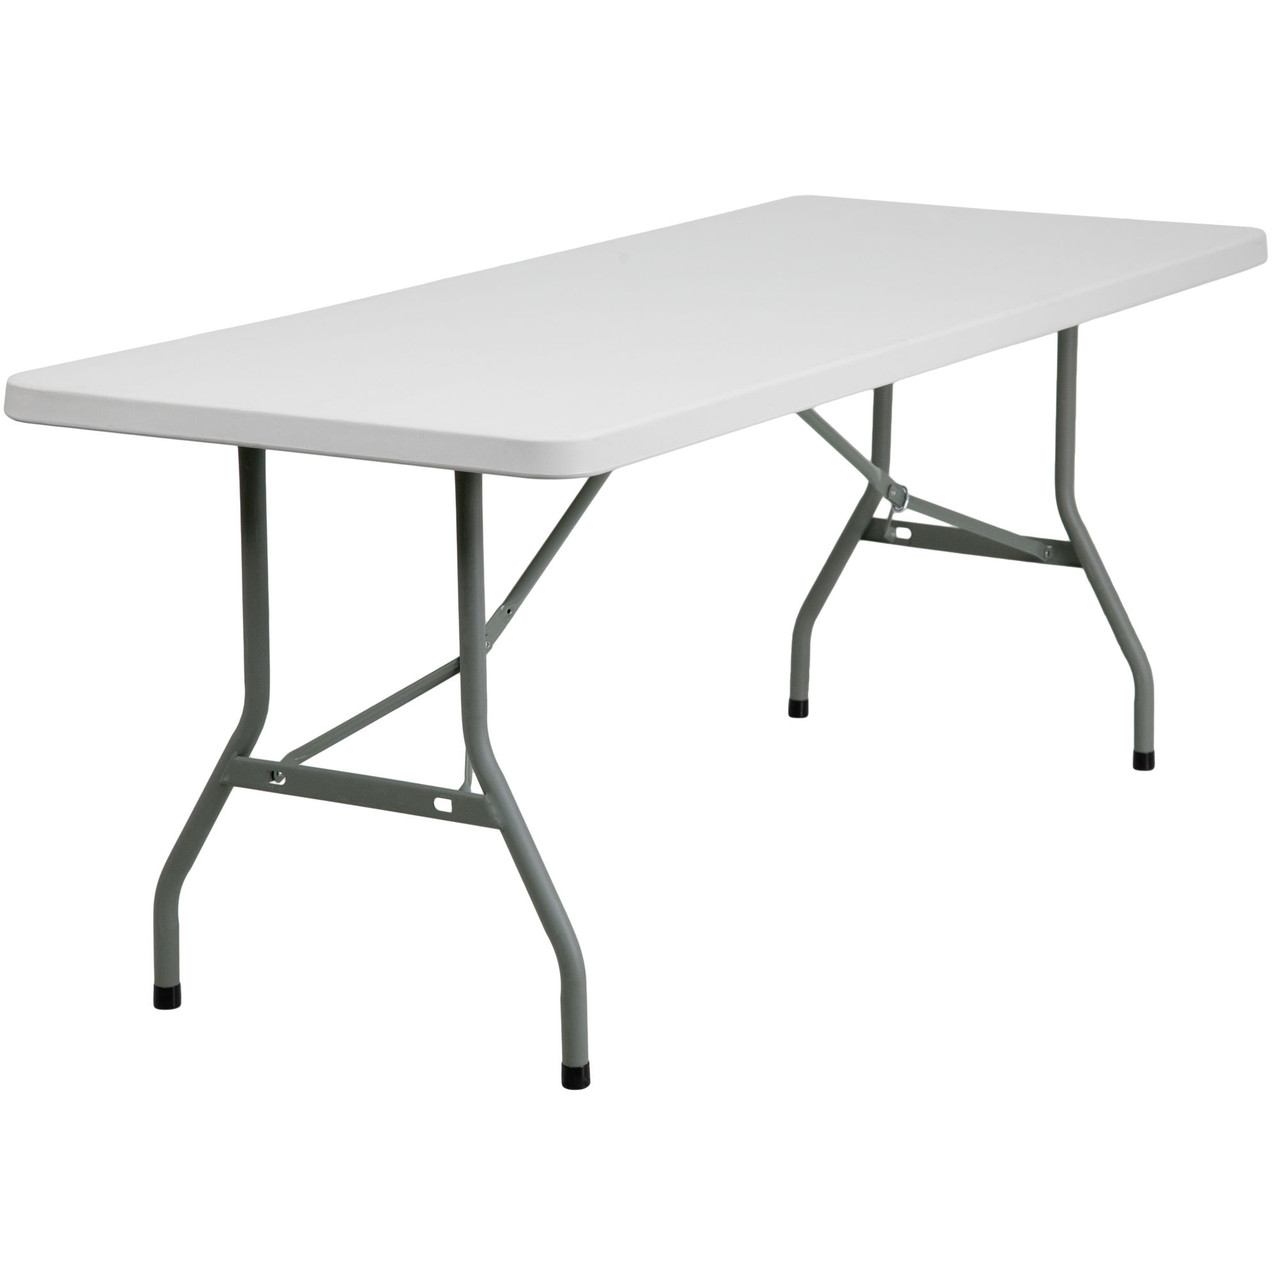 Wondrous 10 Pack Advantage 6 Ft White Plastic Folding Tables 10 Rb 3072 Gg Forskolin Free Trial Chair Design Images Forskolin Free Trialorg